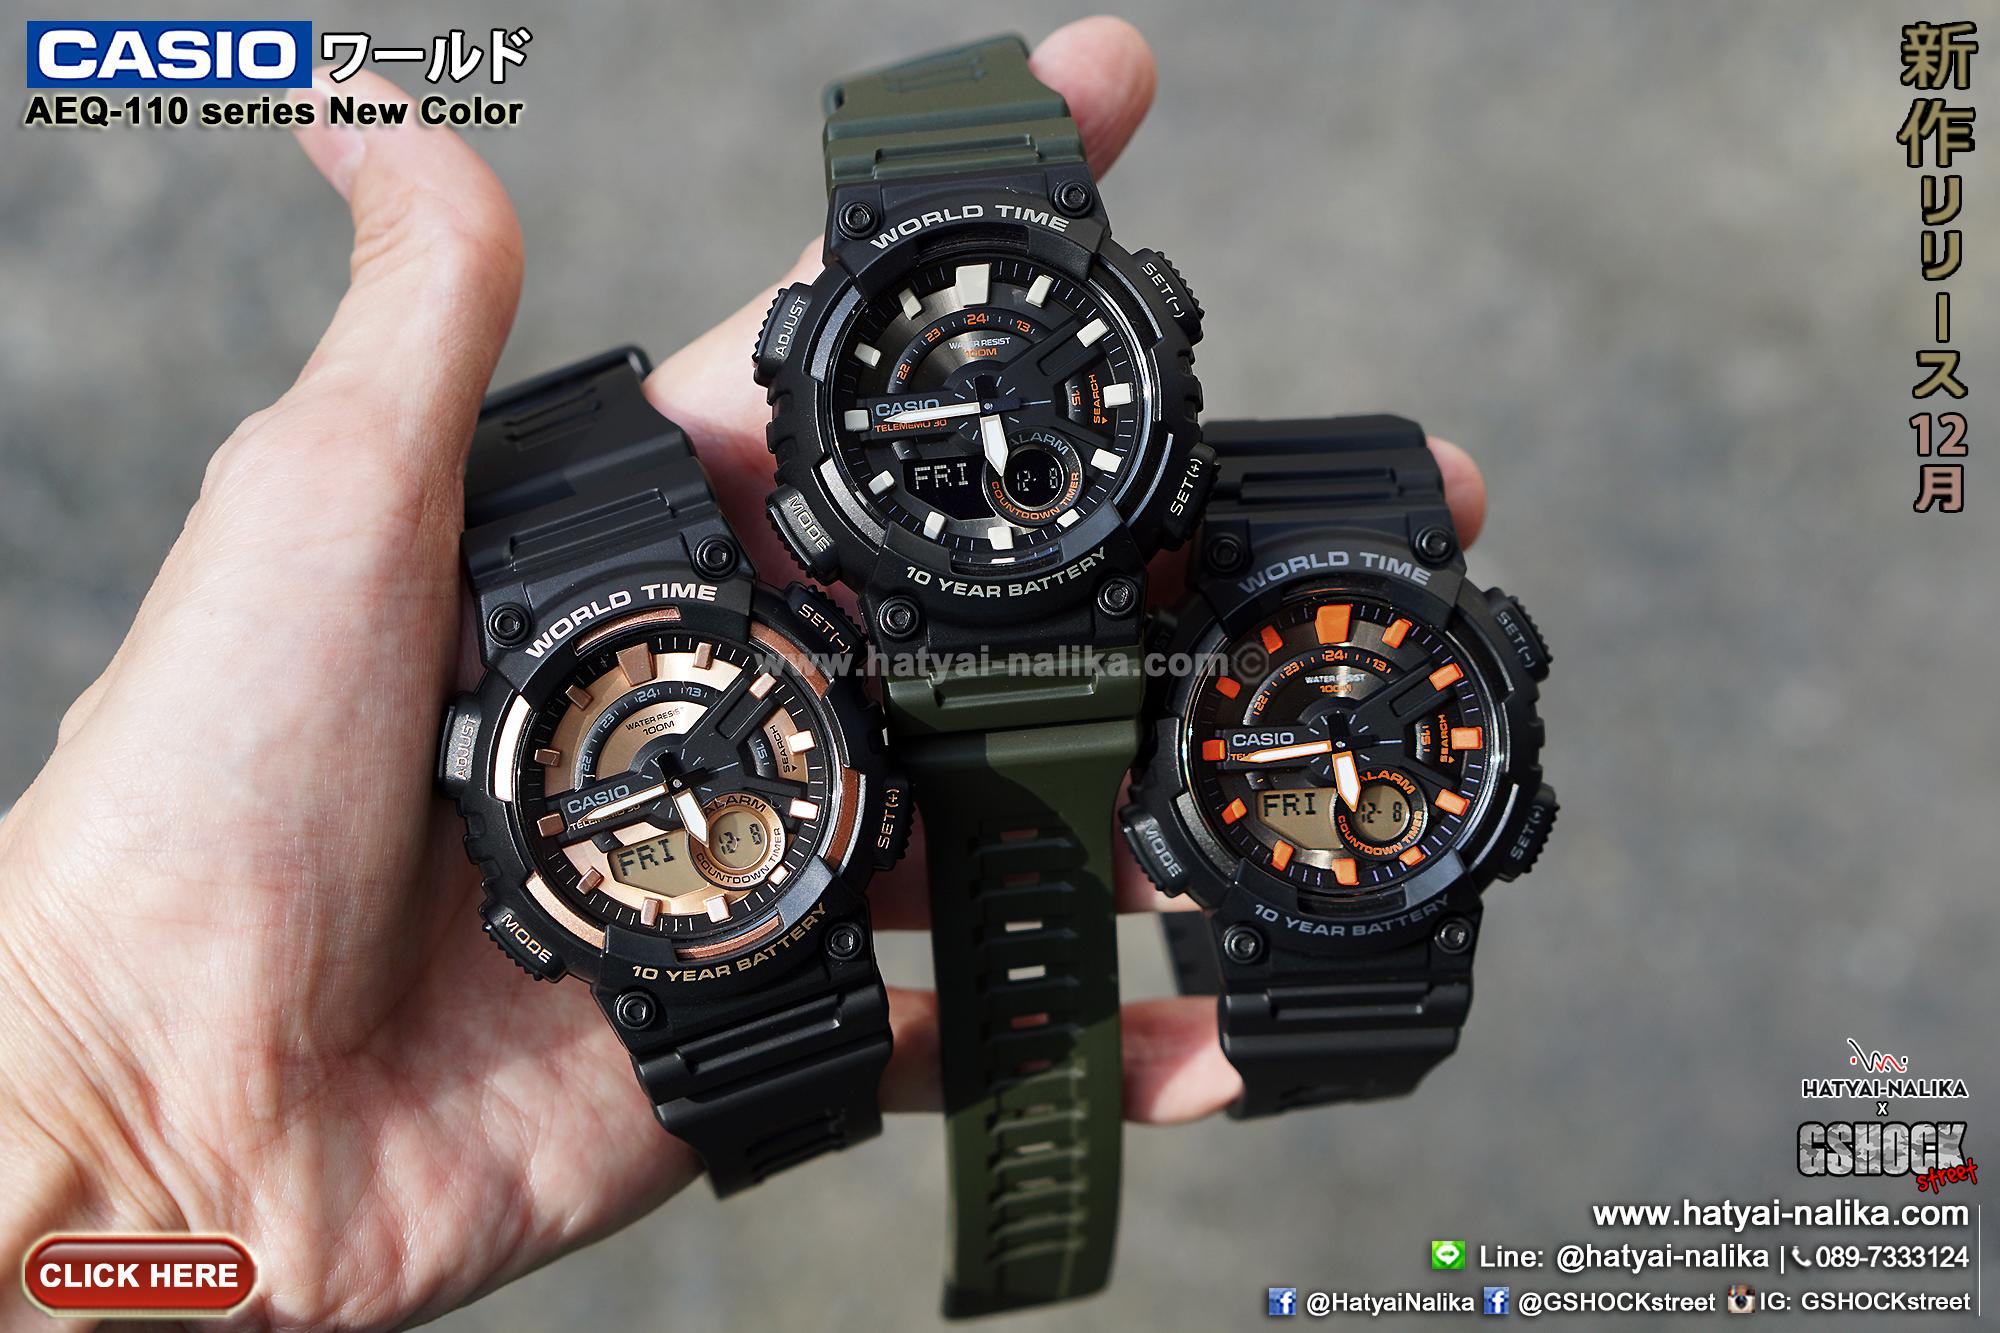 AEQ-110W-1A2_AEQ-110W-1A3_AEQ-110W-3A